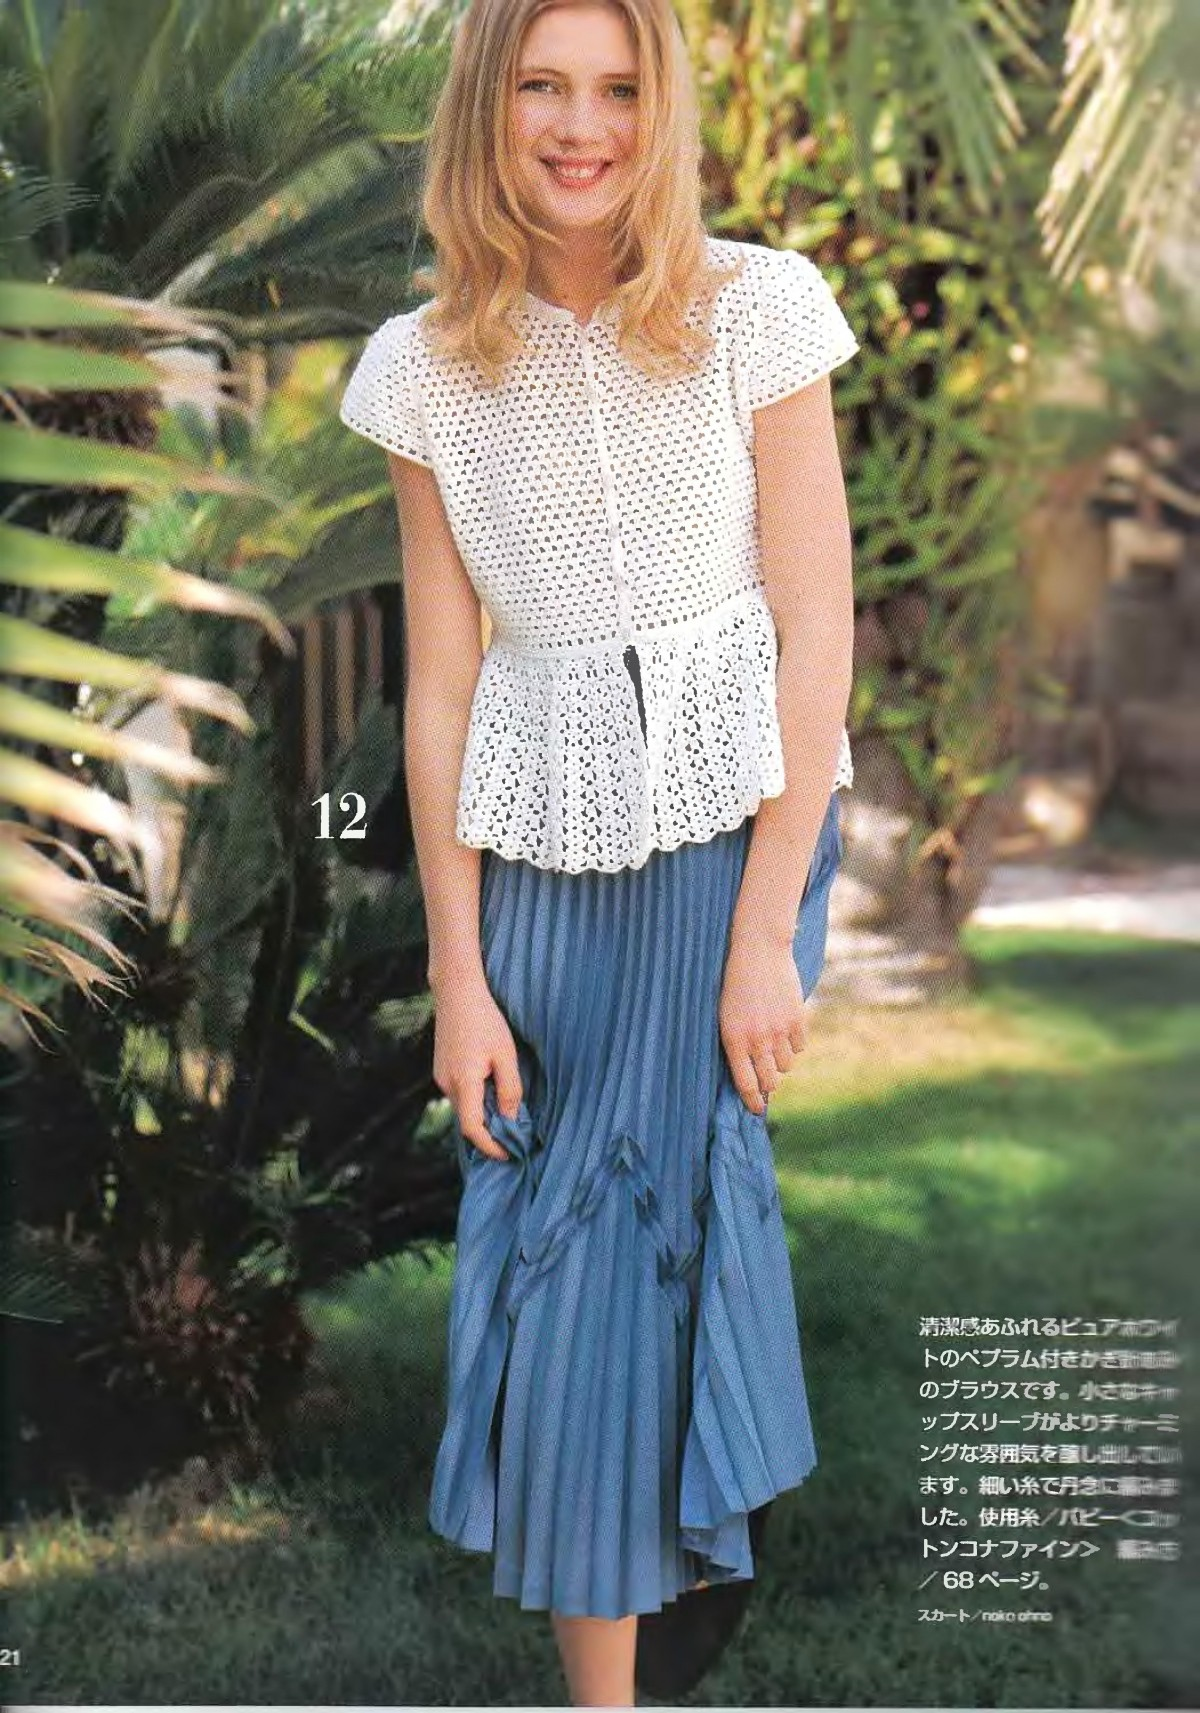 Lets-knit-series-NV4359-2008-Spring-Summer-sp-kr_19.jpg